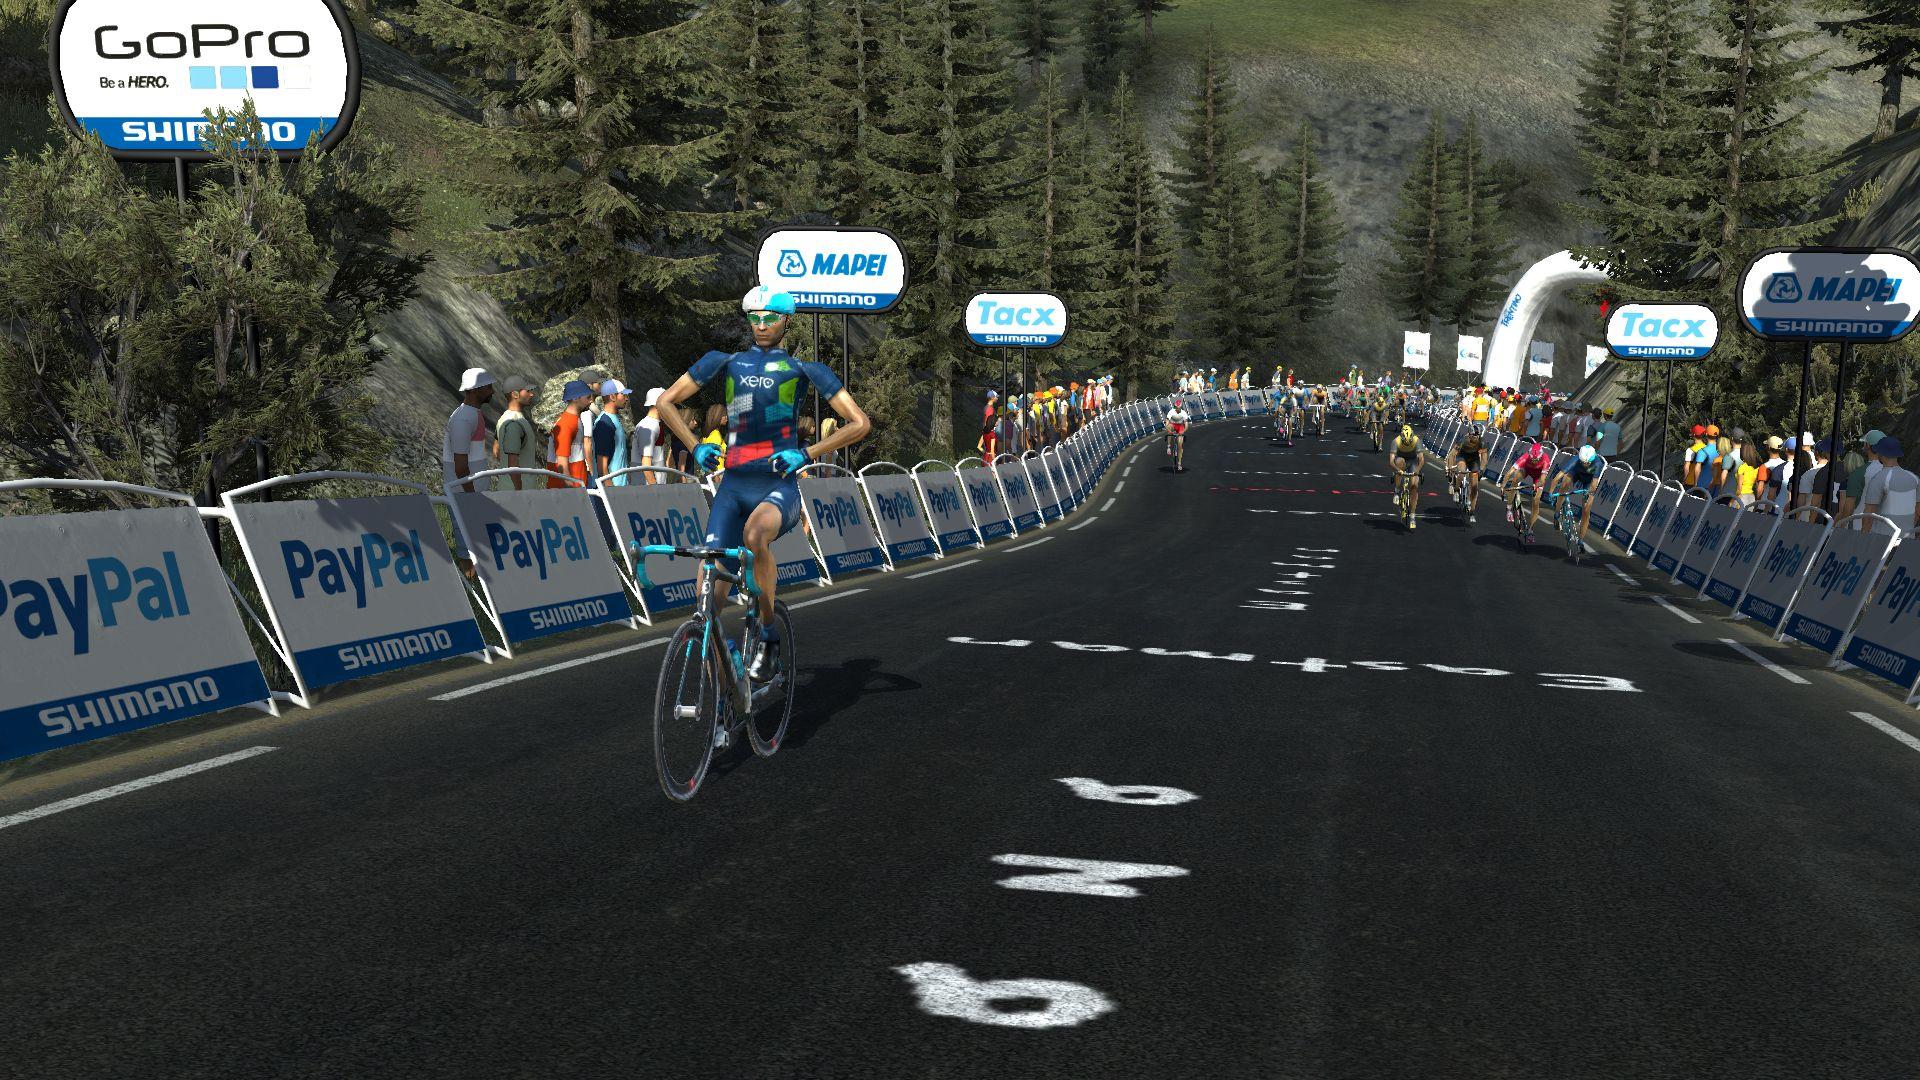 pcmdaily.com/images/mg/2017/Races/CT/Trentino/mg2017_trentino_04_PCM0160.jpg